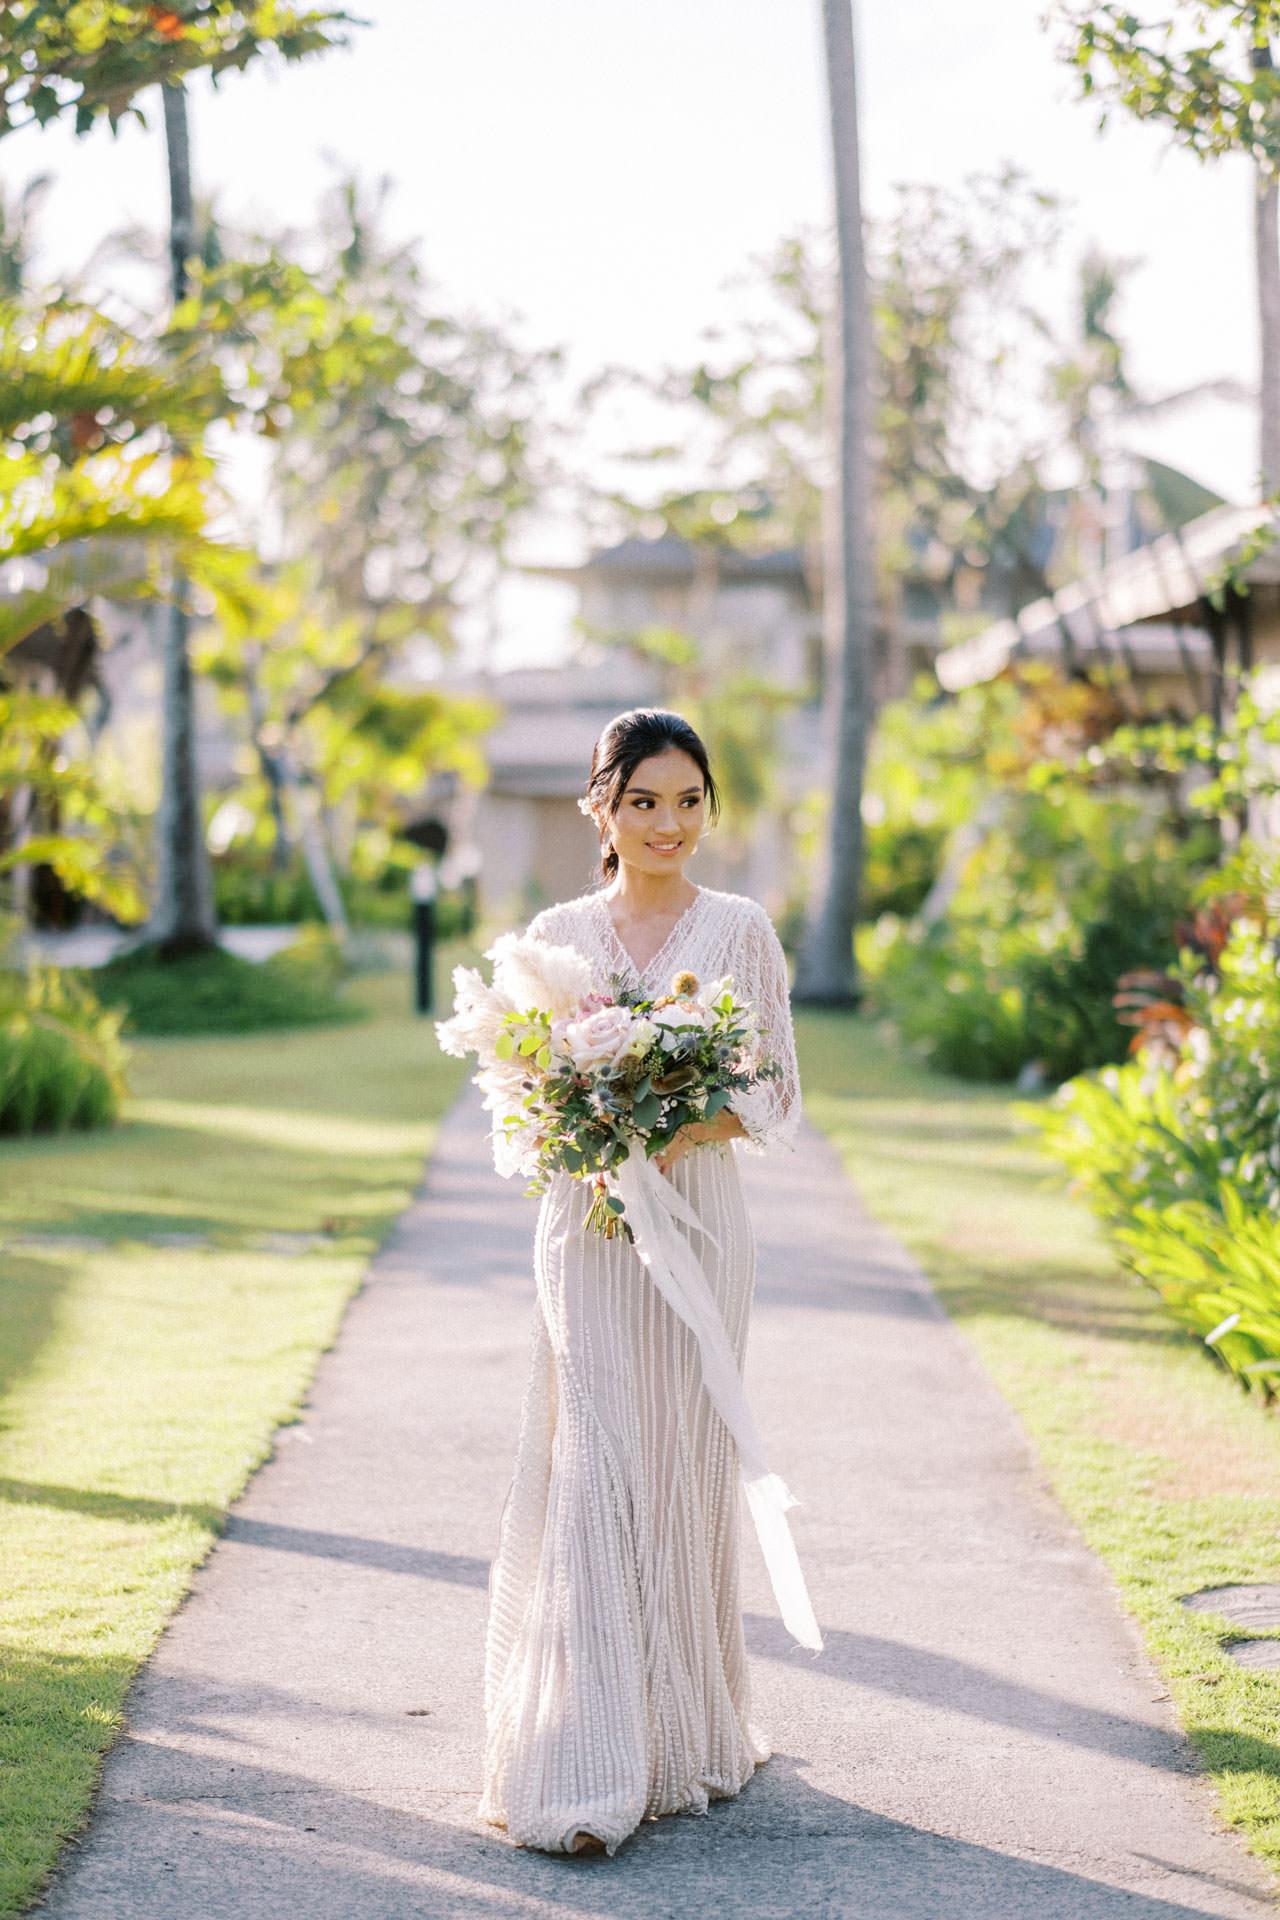 Bali Beach Glamping Wedding on a Luxury Tent 25